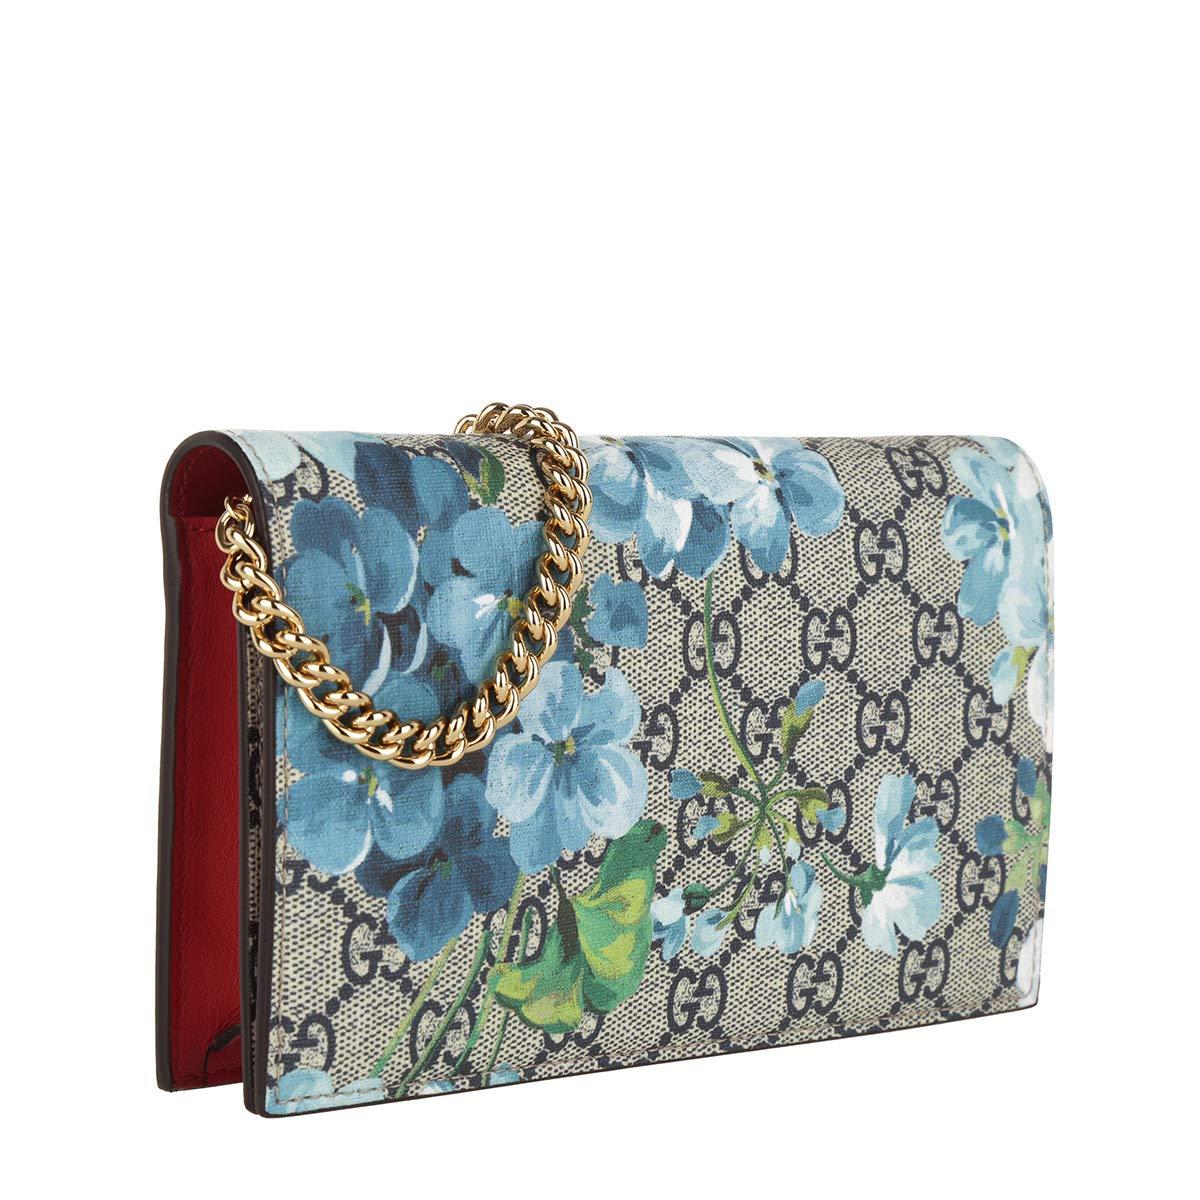 41e535ece5 Amazon.com: GUCCI Handbag BAMBOO DAILY SMALL BLOOMS Red Leather Bag ...